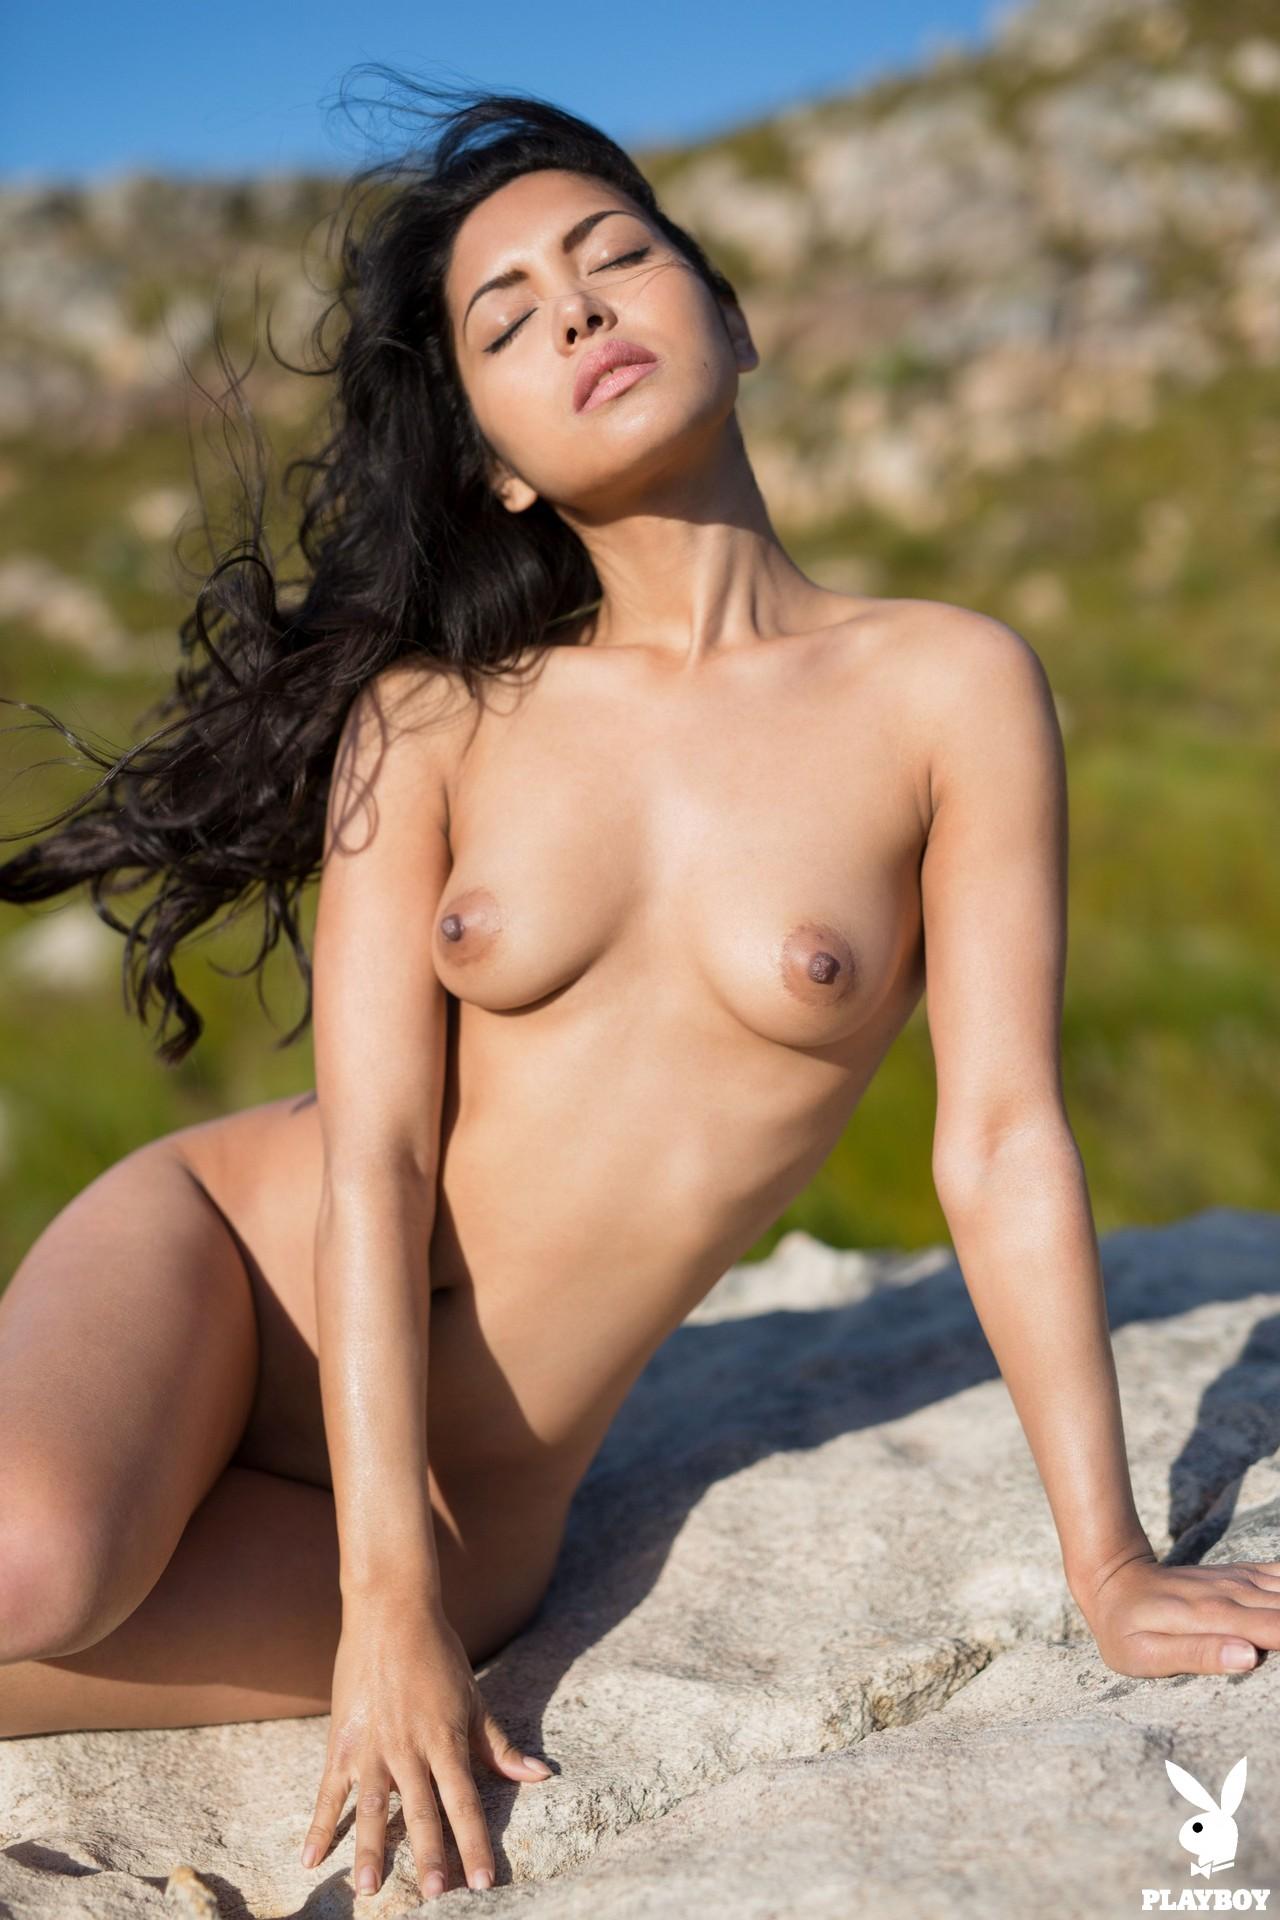 Chloe Rose in Trail Blazing 6